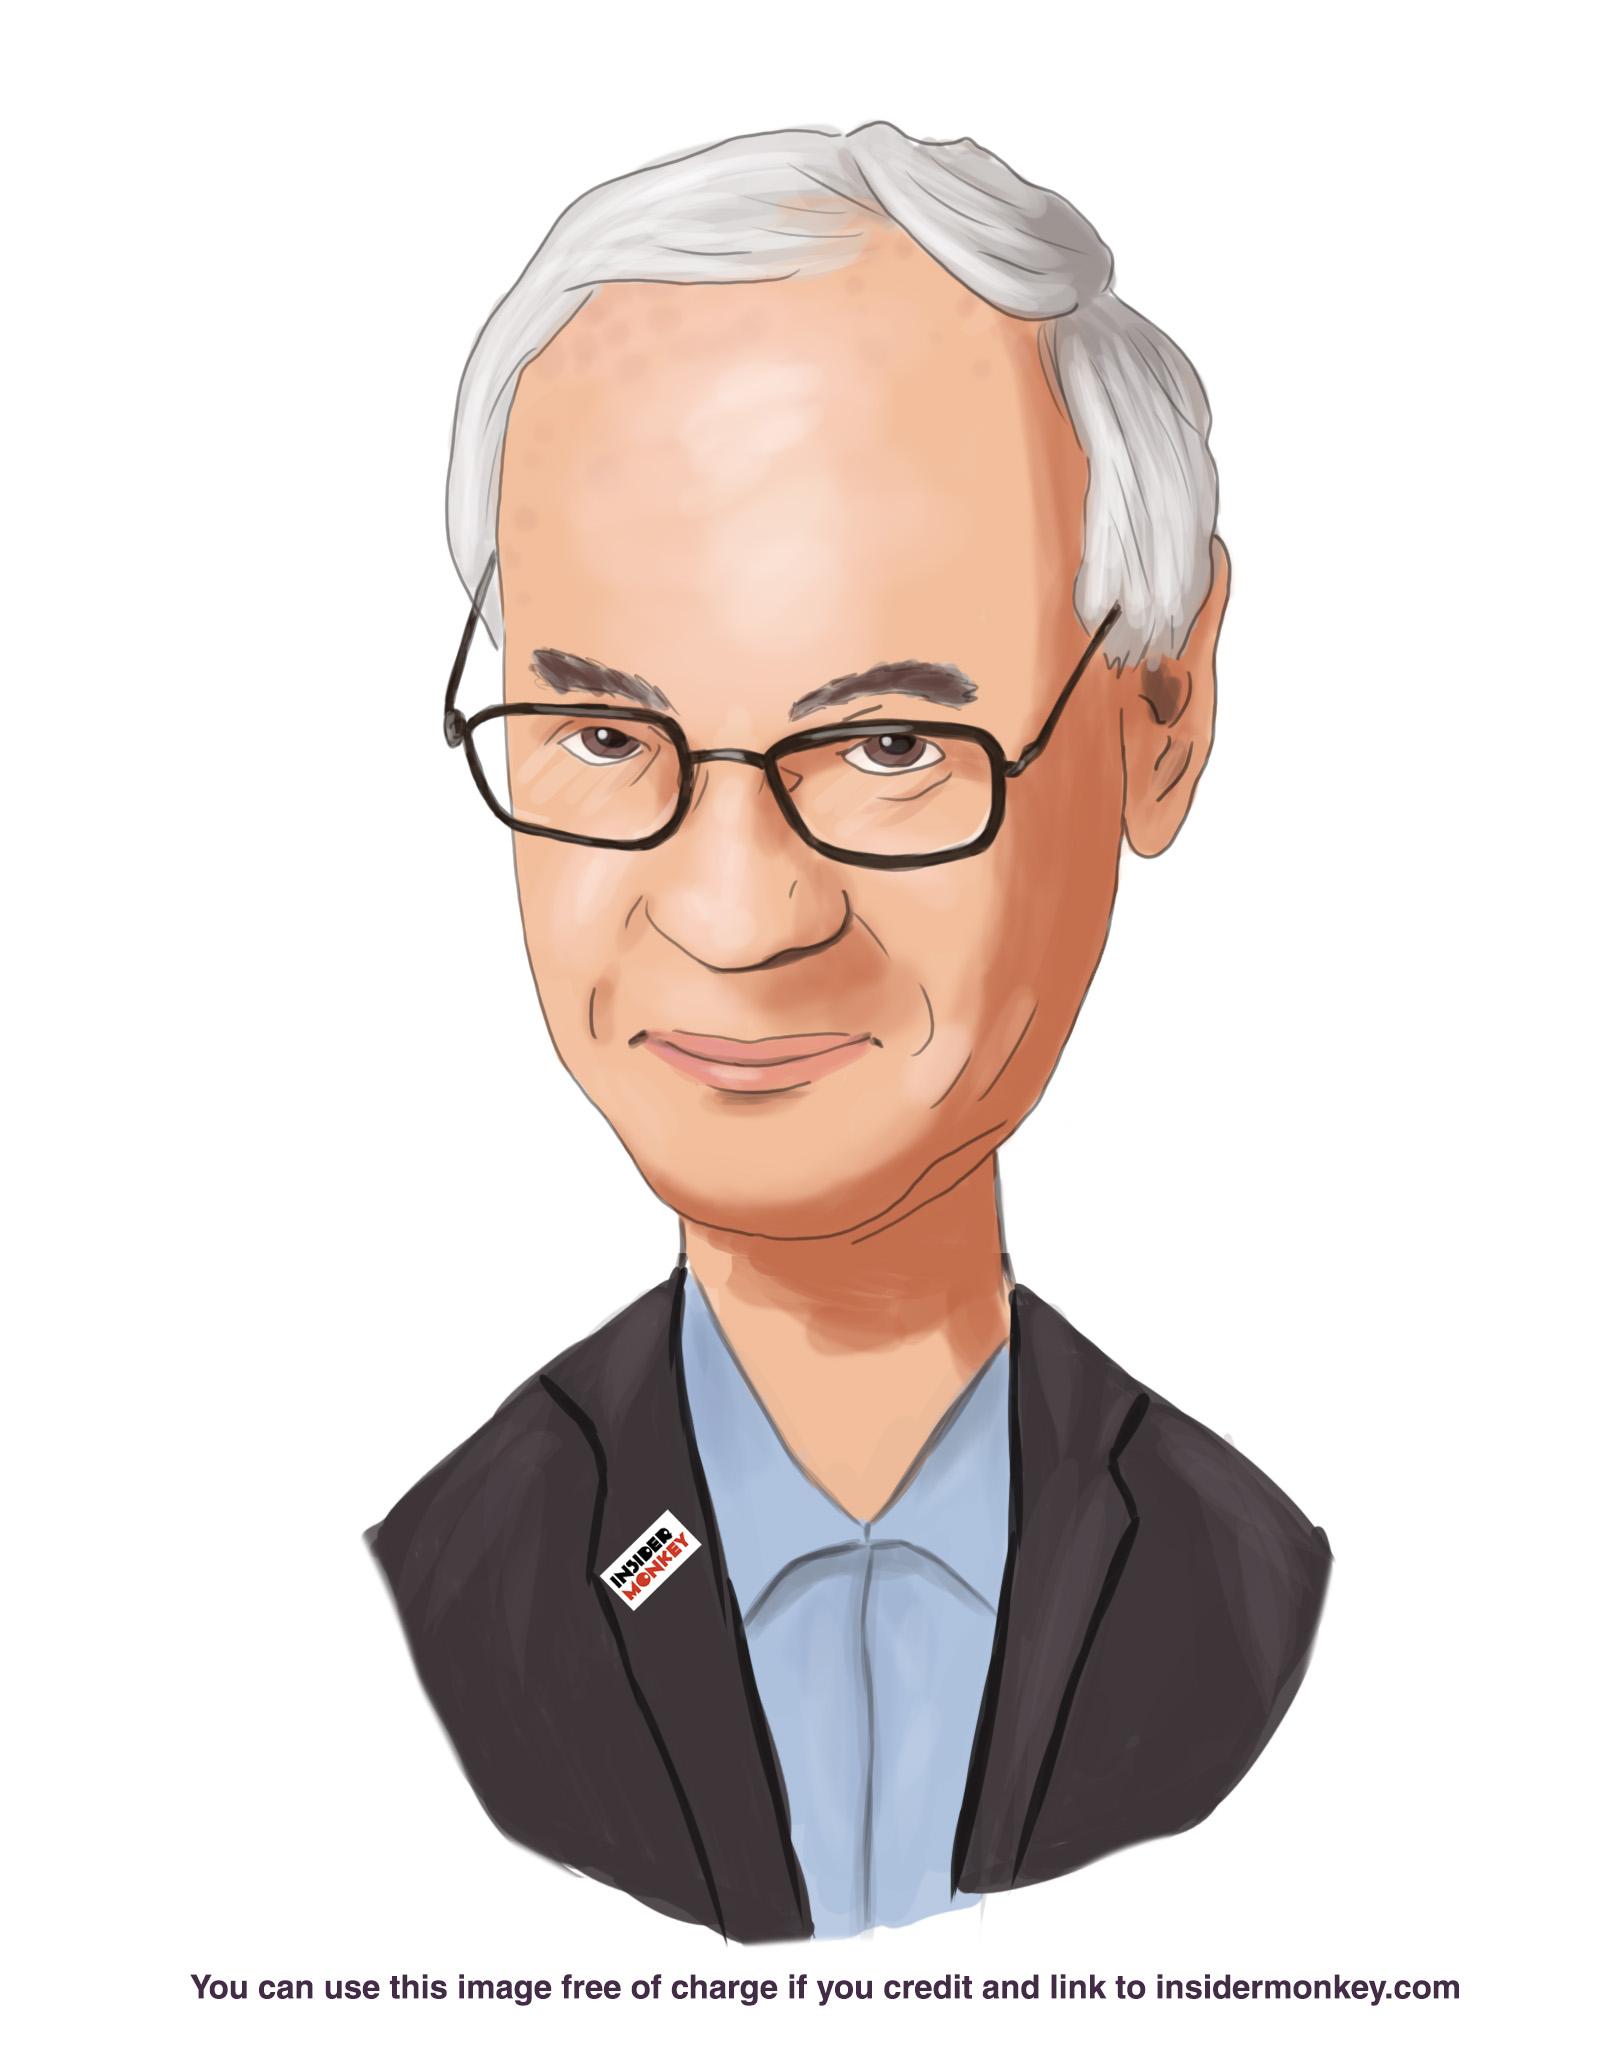 Emanuel J. Friedman